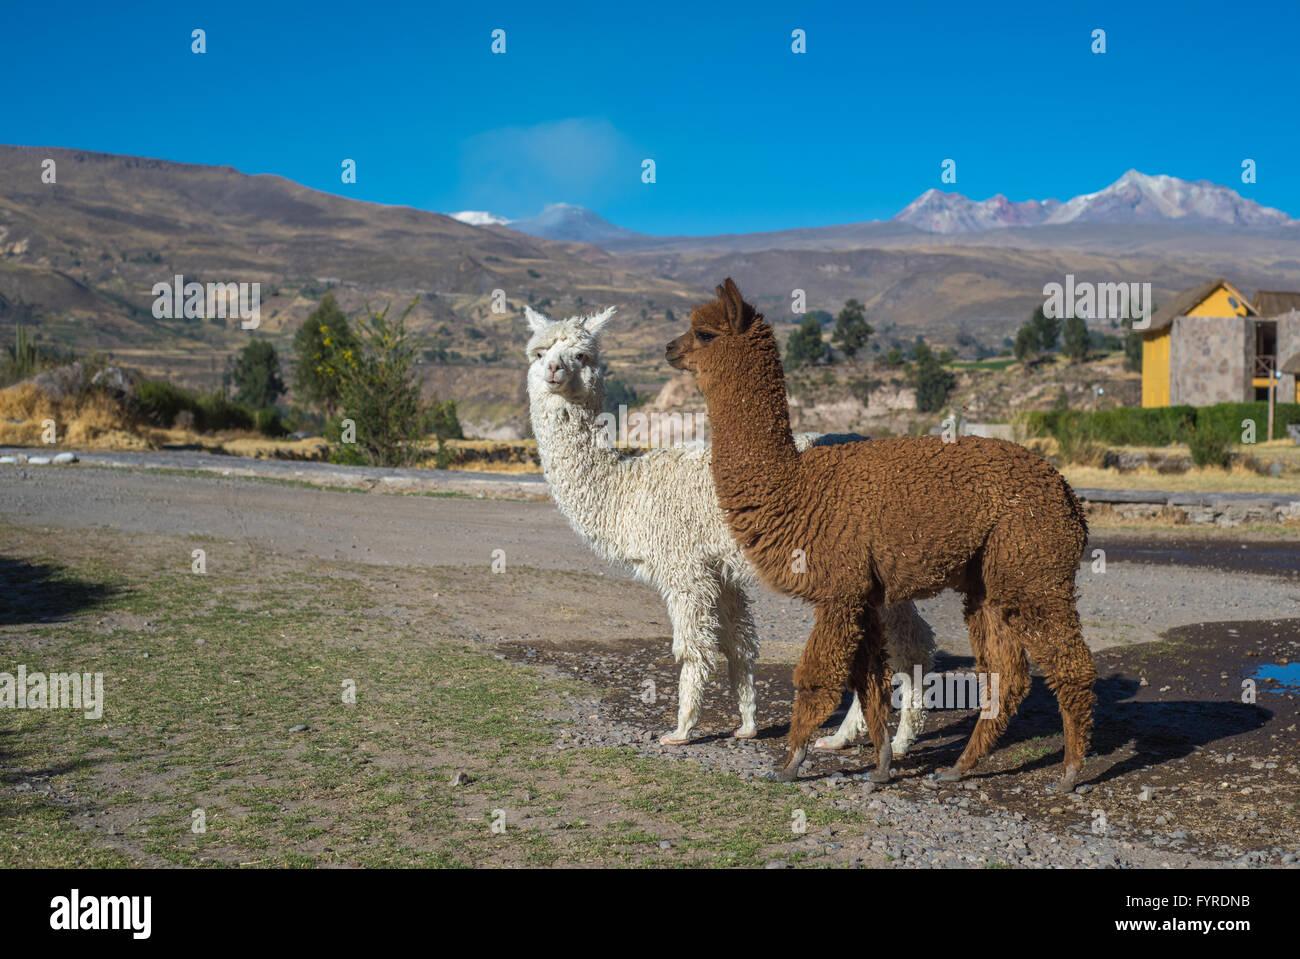 Les alpagas péruviens Photo Stock